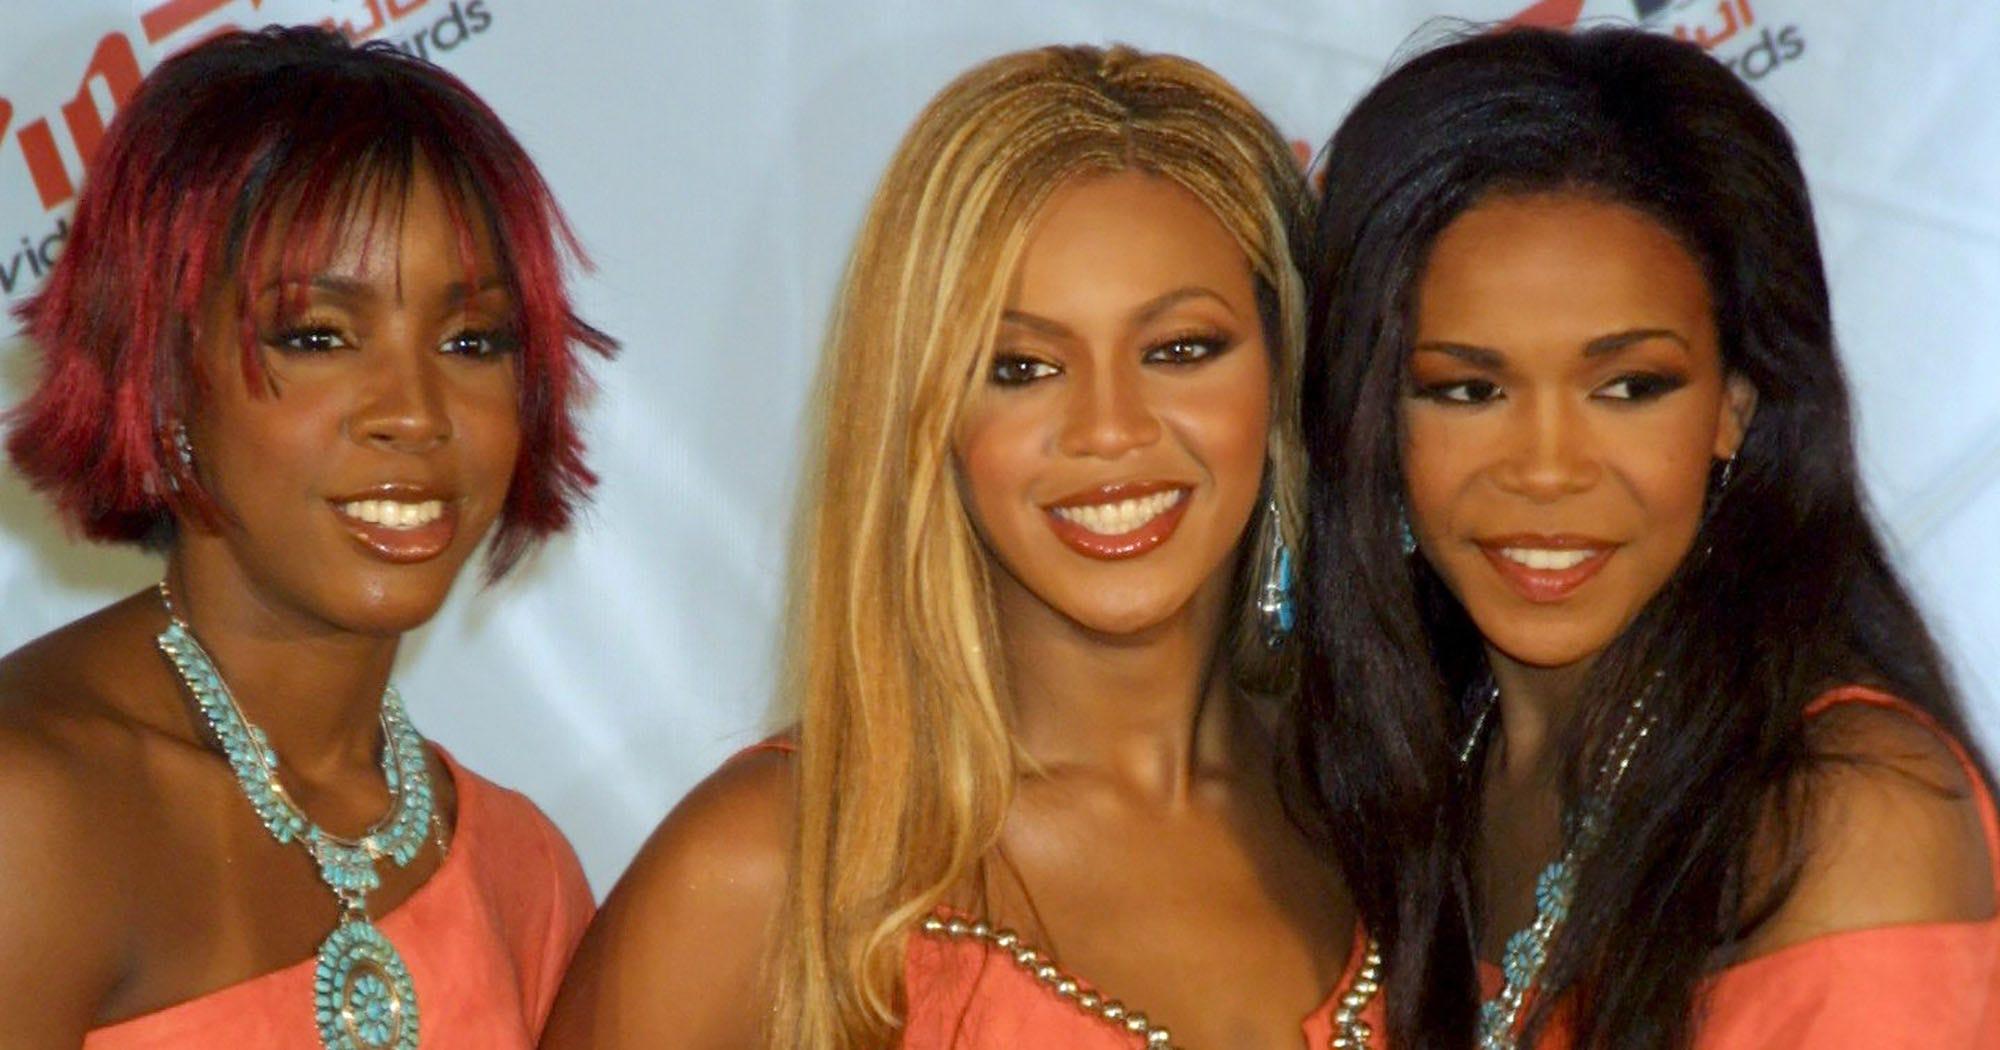 Destinys Child Reunion Kelly Rowland Birthday Party